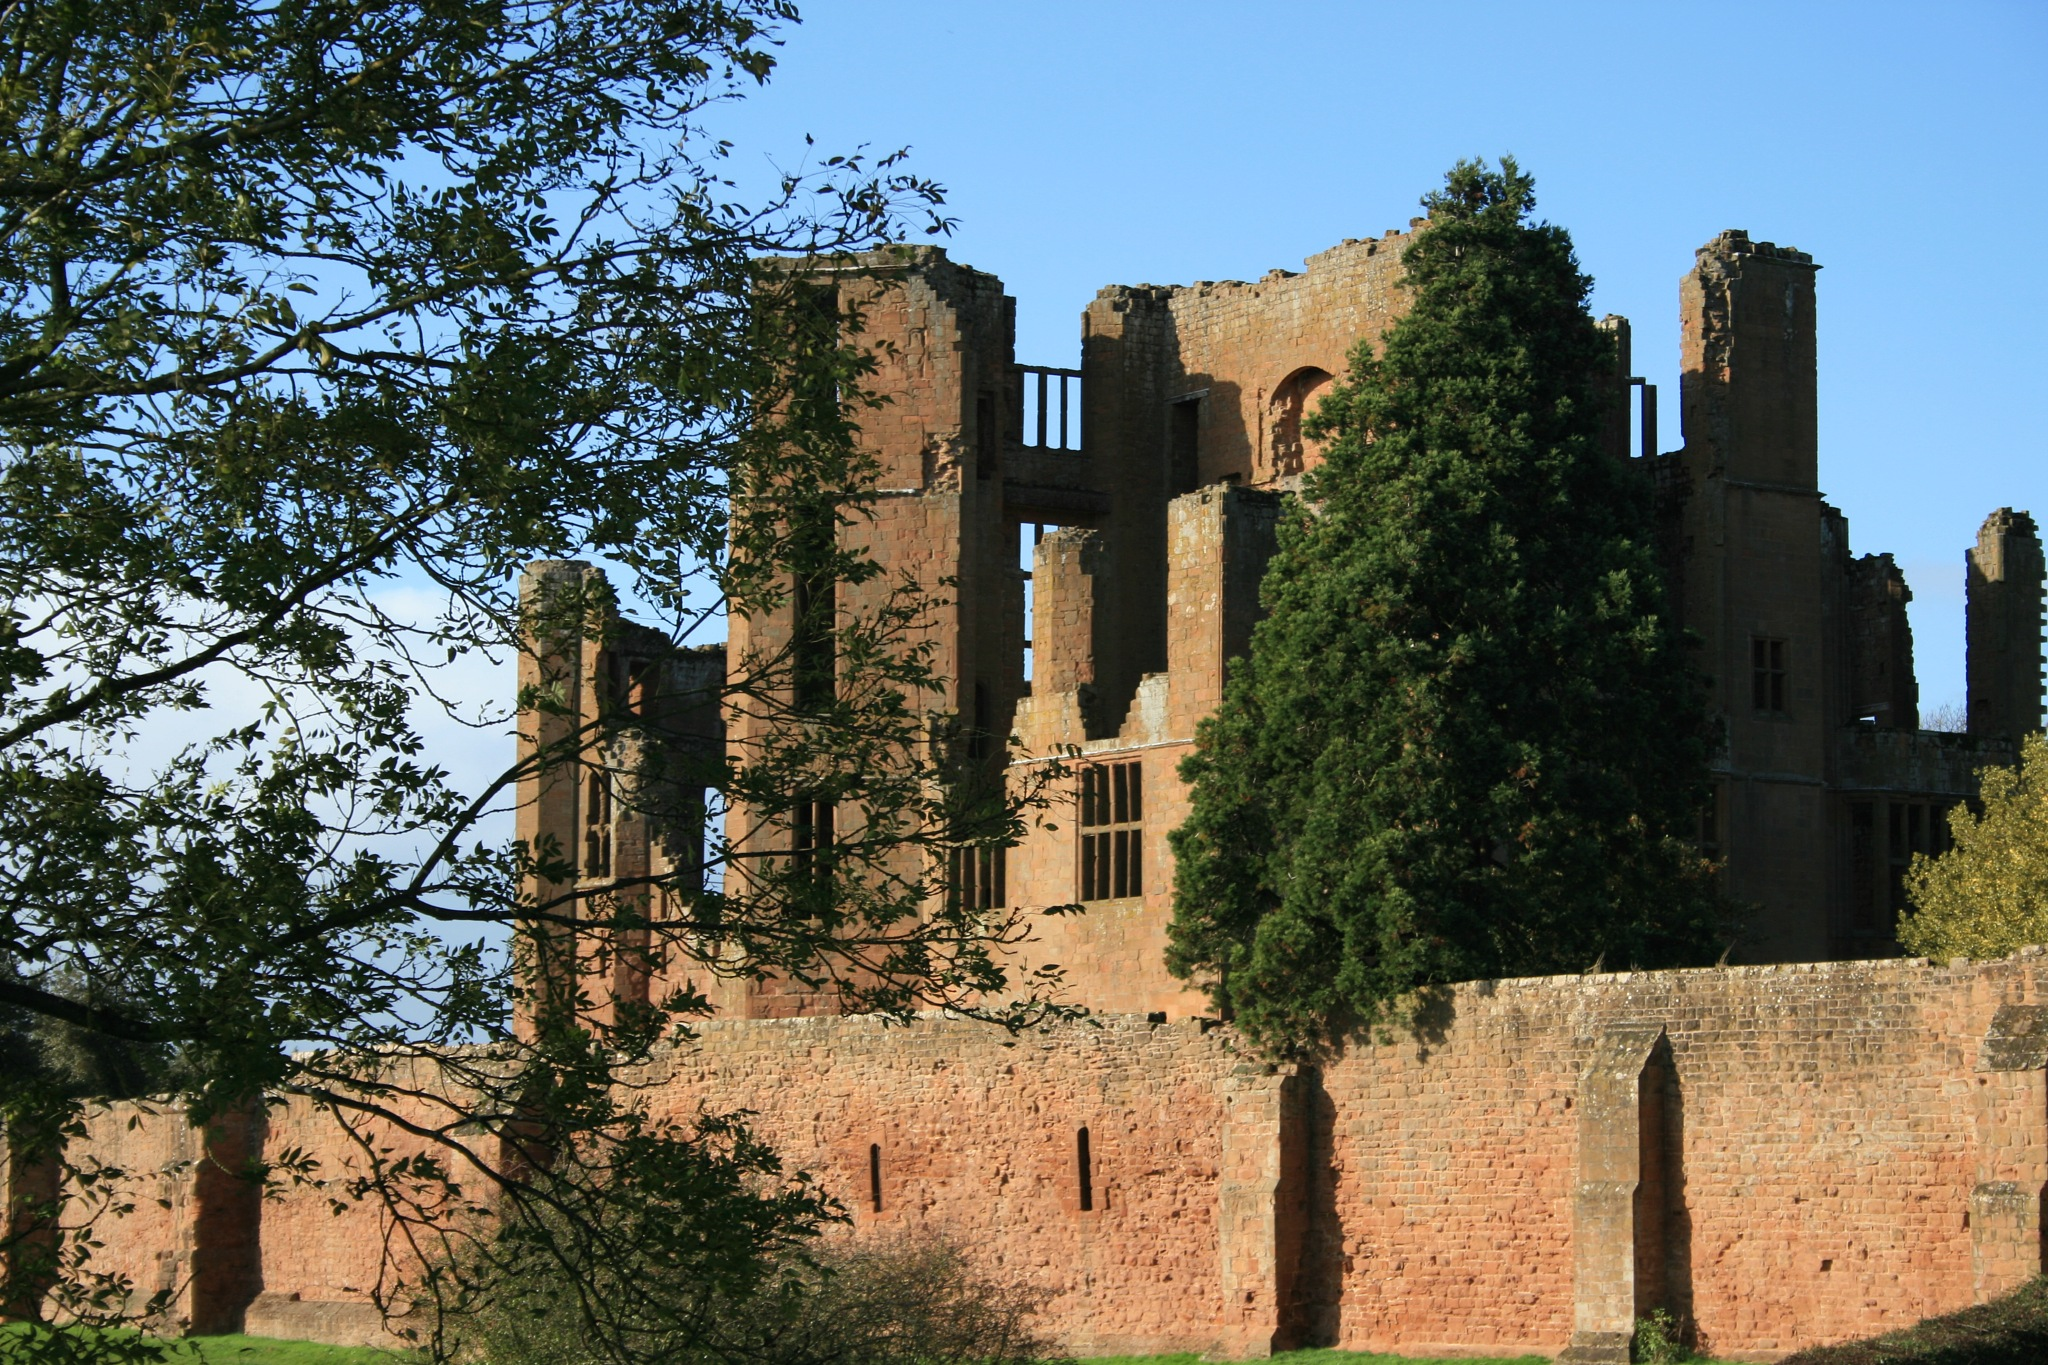 Castle ruins by Daveschoie